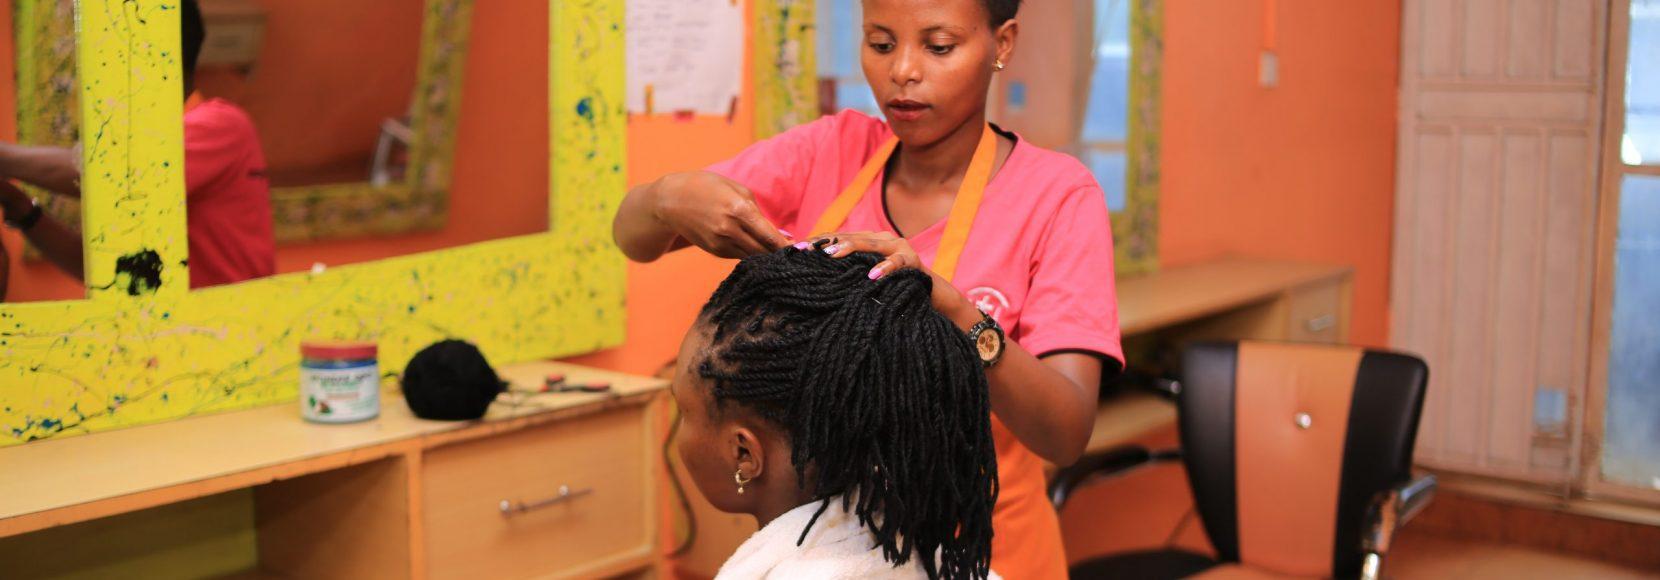 Carolyn works on a client in her salon business near Kampala, Uganda